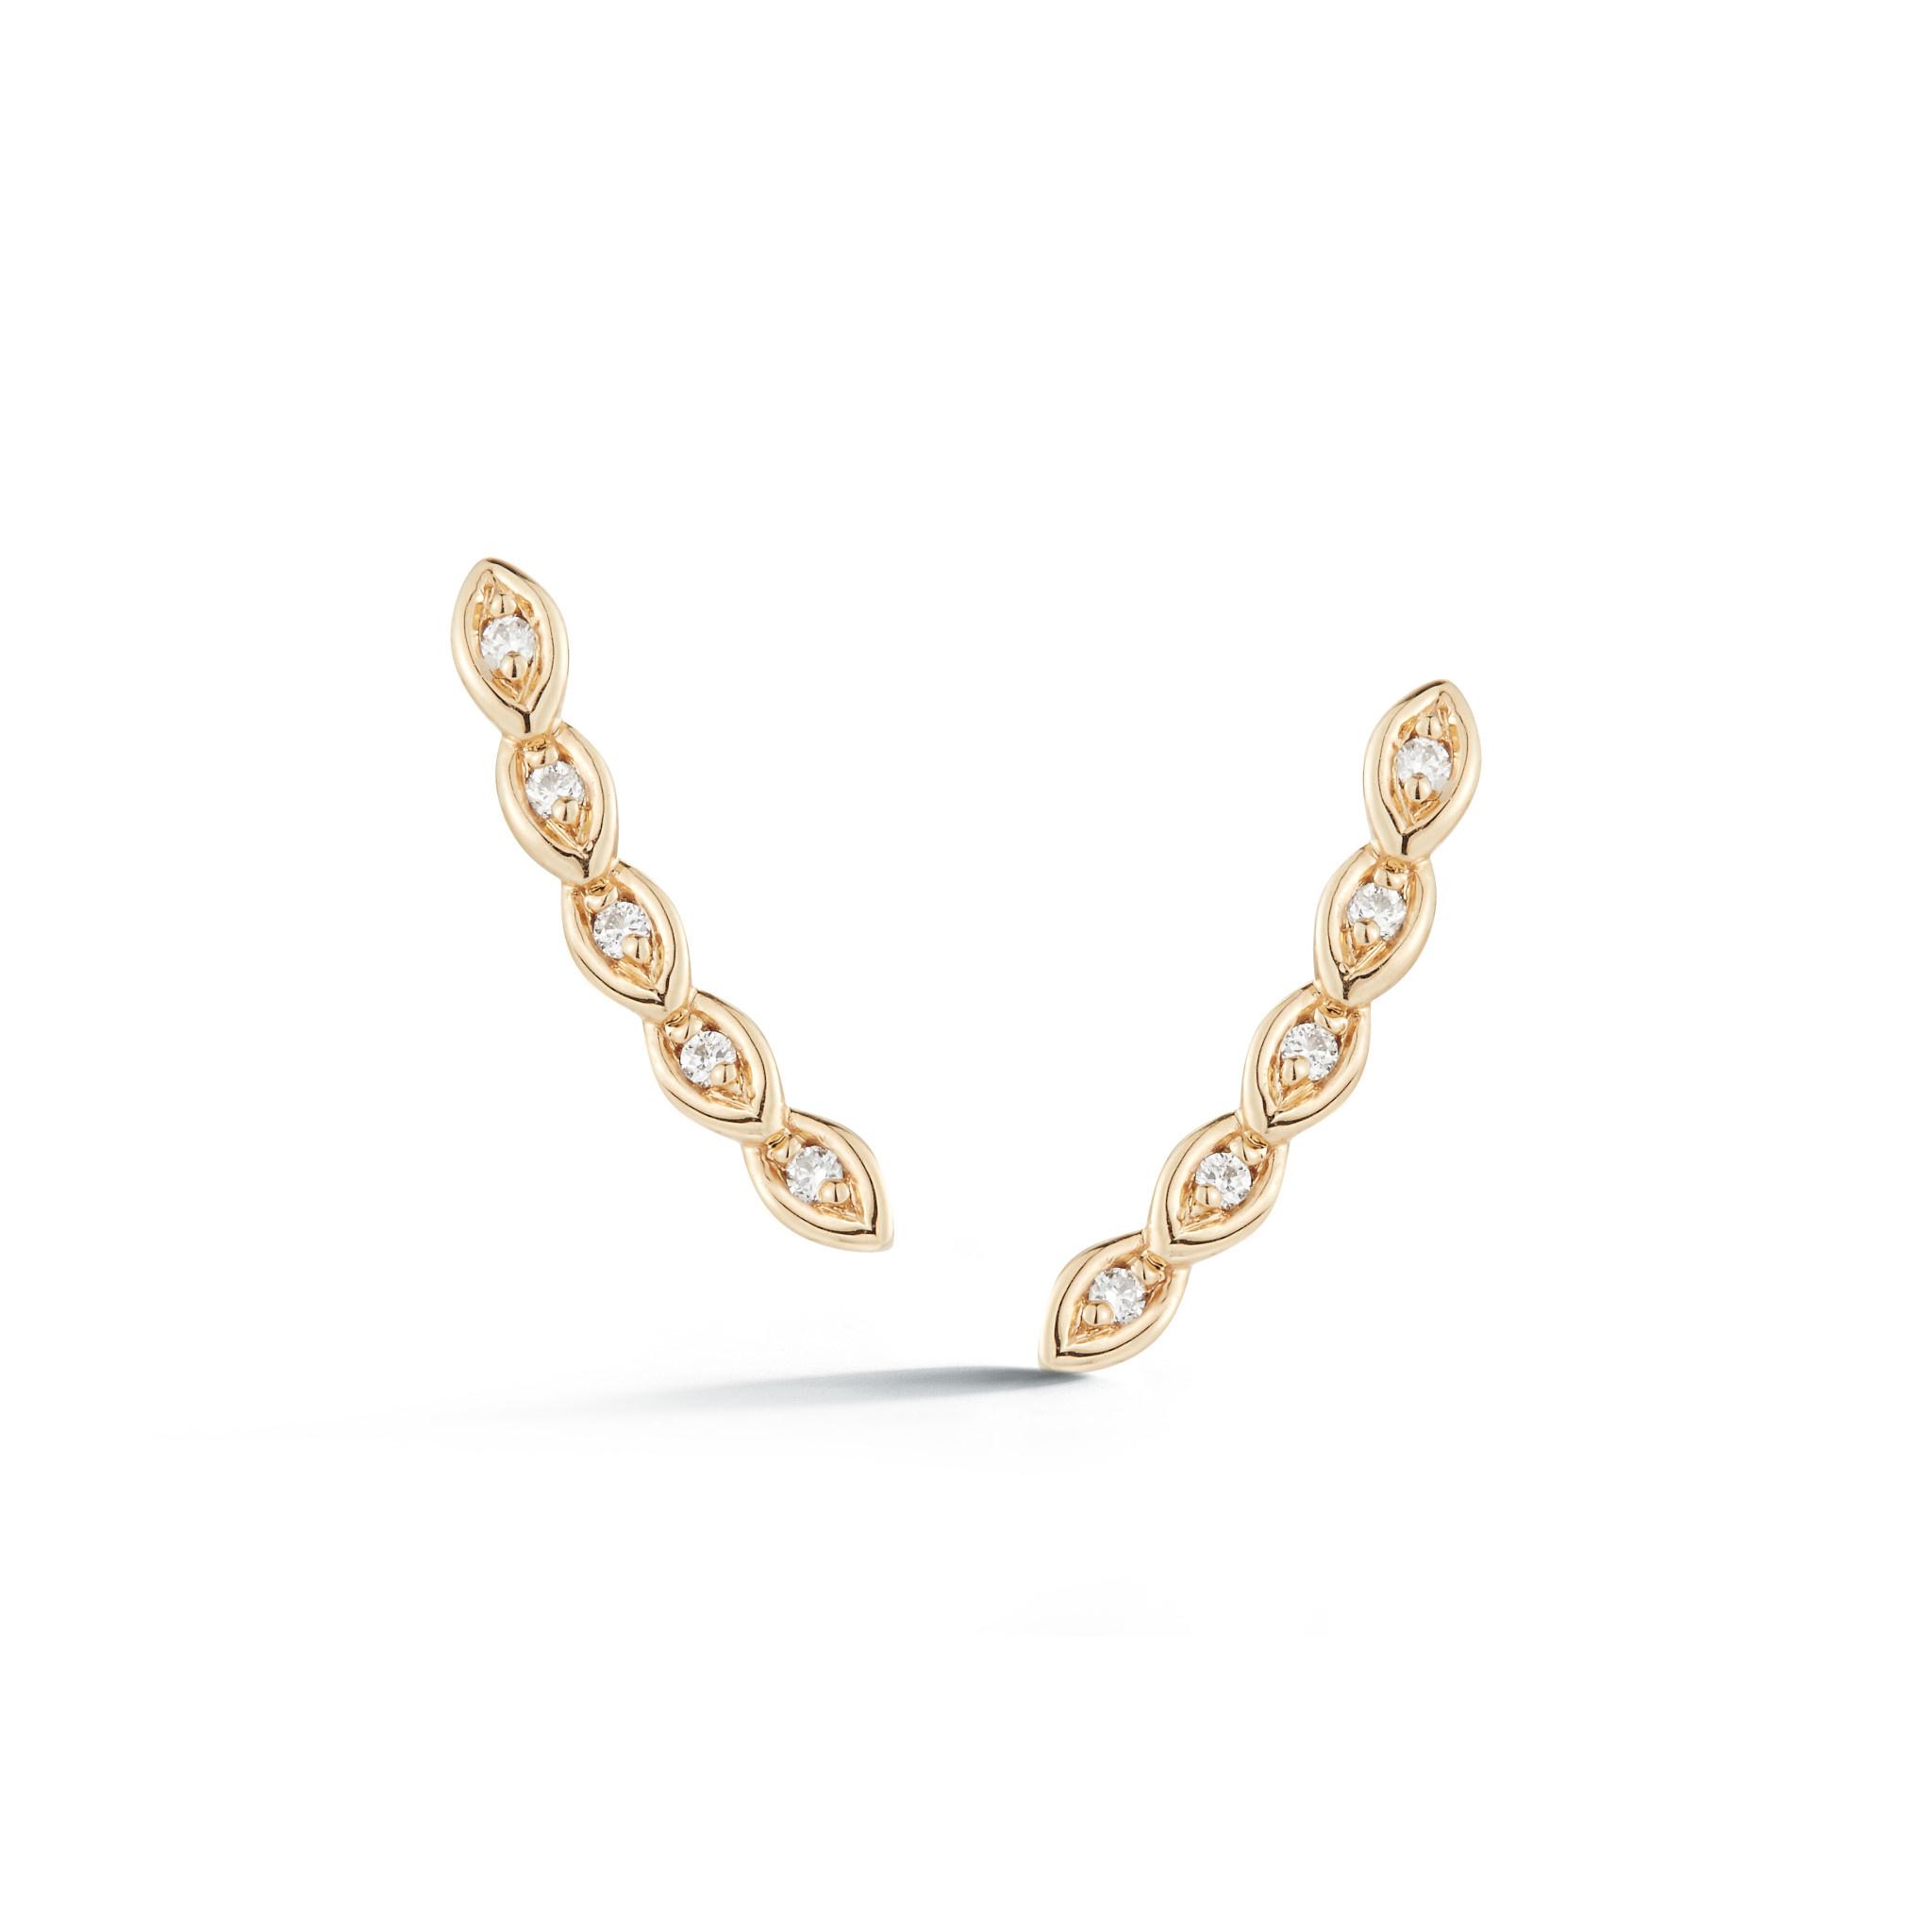 Dana Rebecca Lori Paige Mini Diamond Climber Earrings